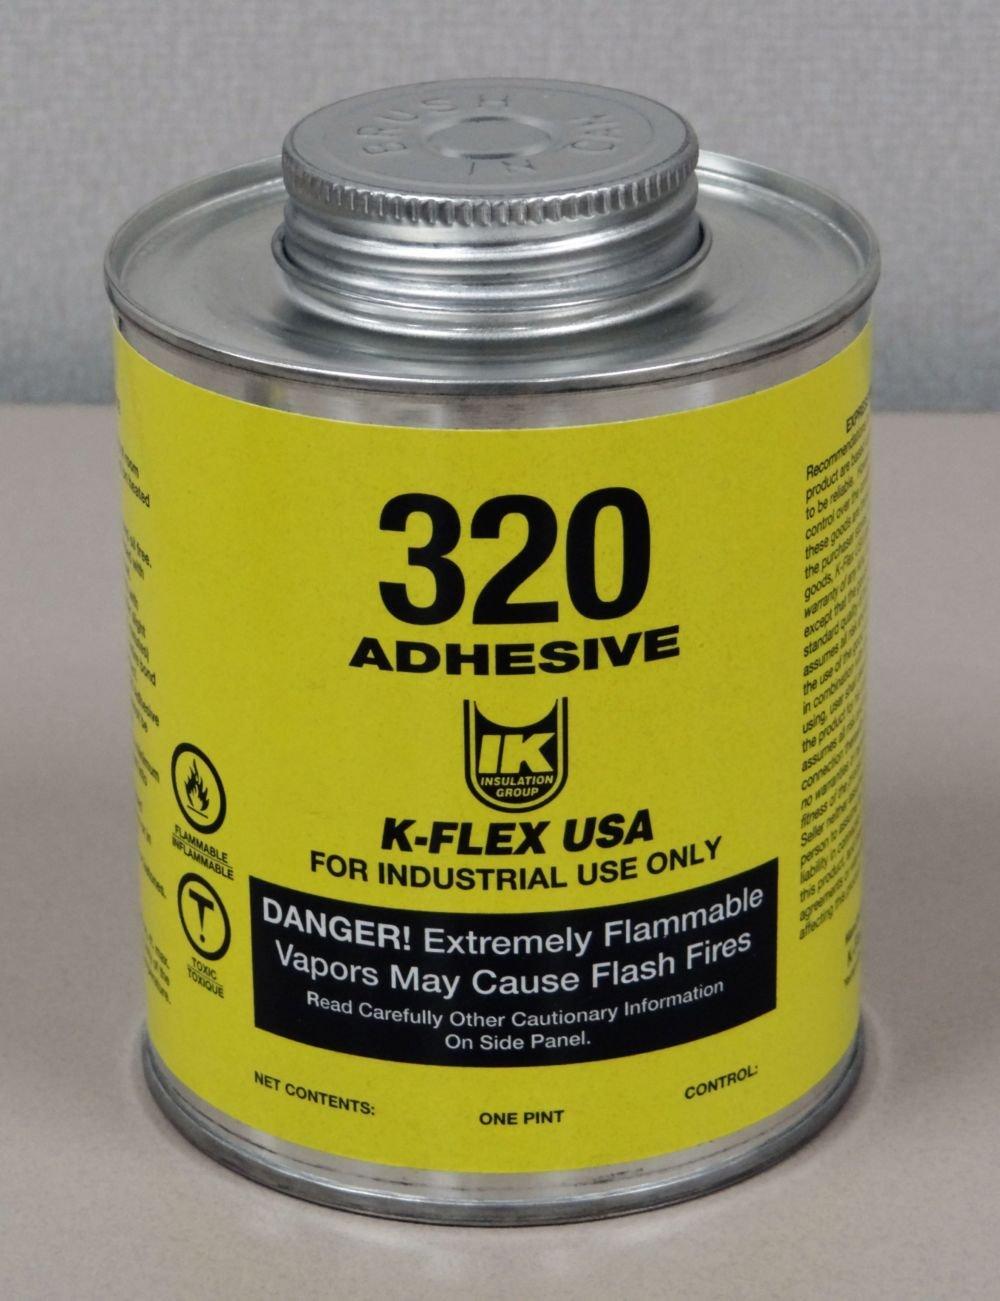 K-FLEX 320 Contact Adhesive (Brush top pint)